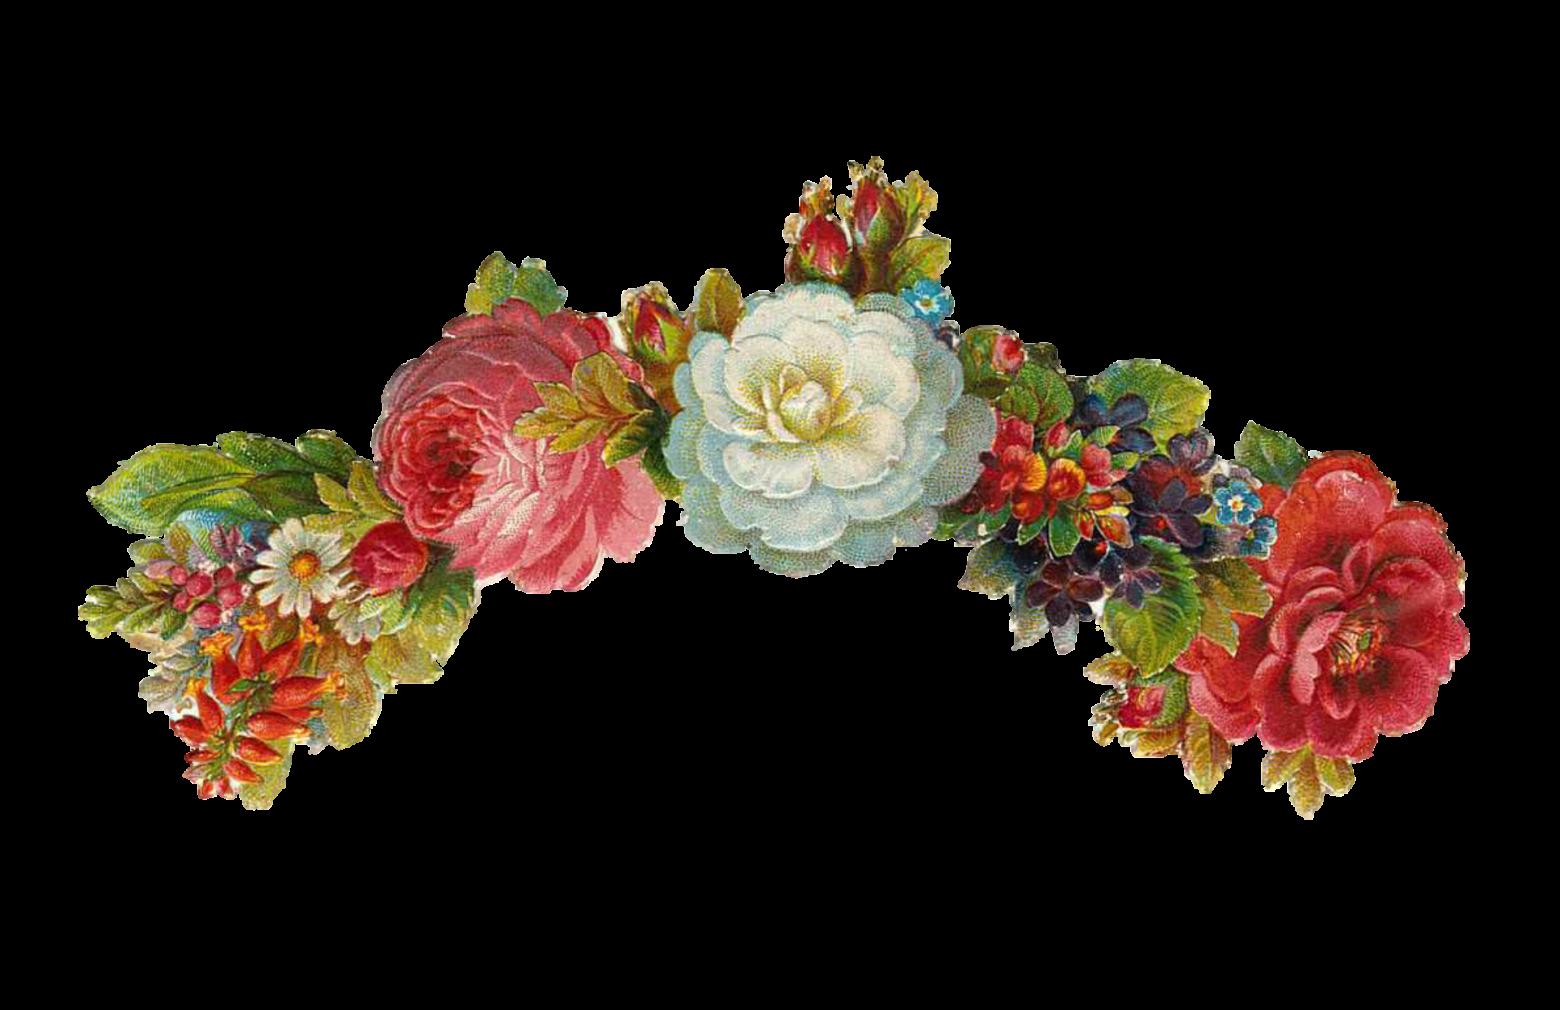 floral-2850295